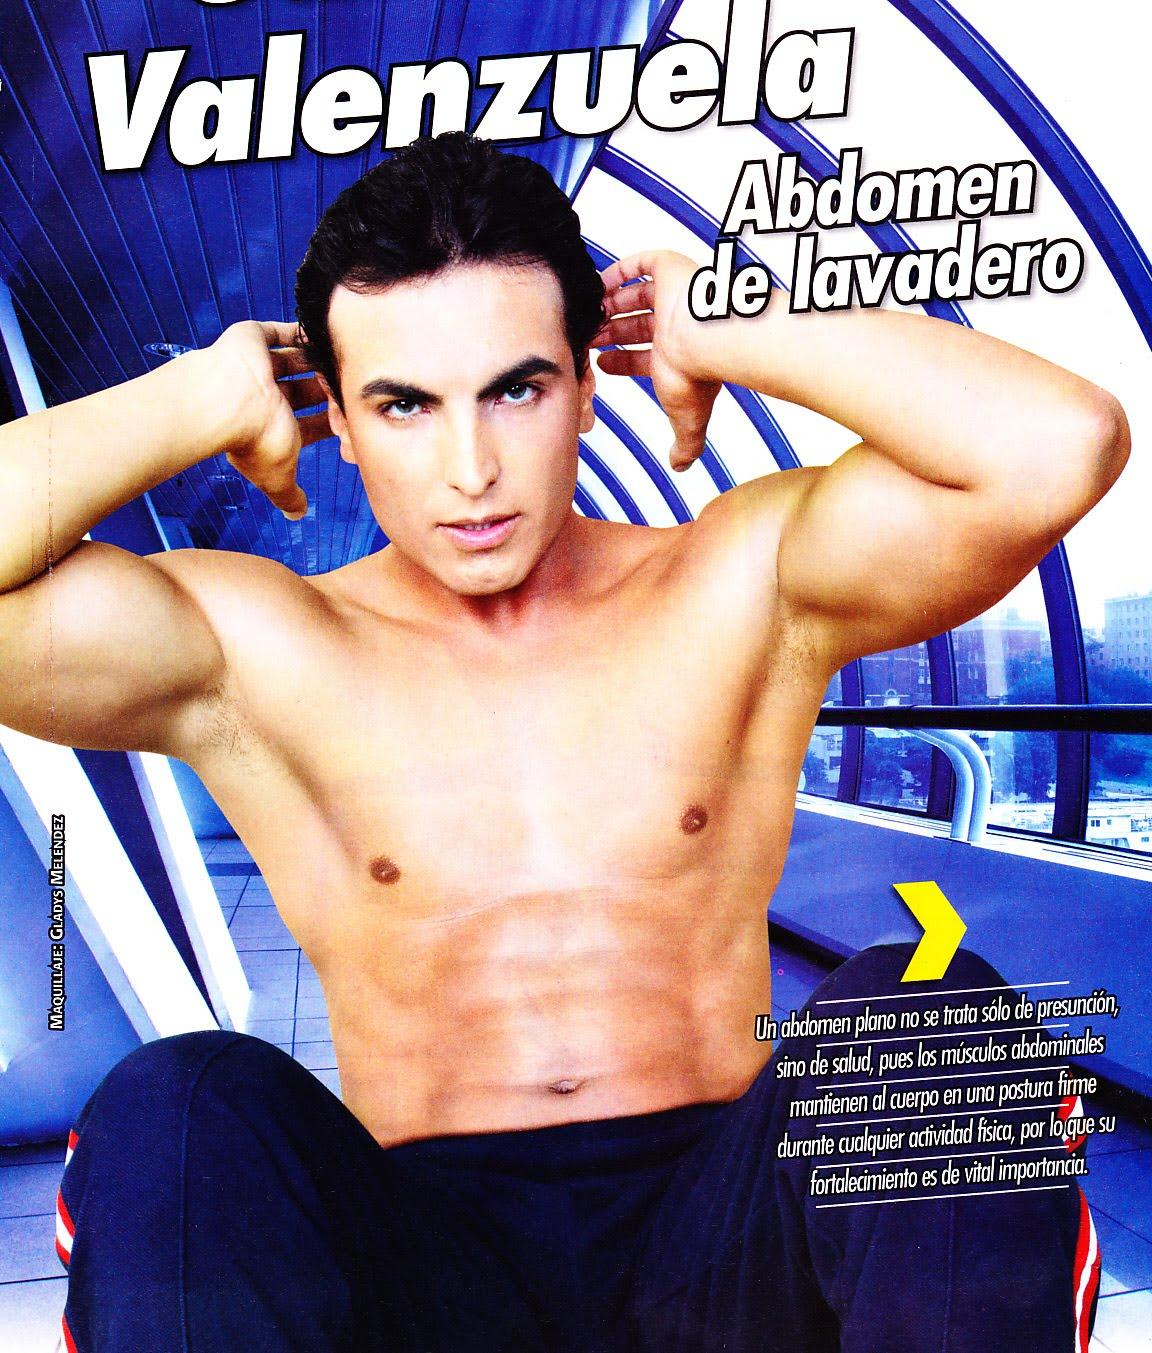 Gabriel Valenzuela/გაბრიელ ვალნსუელა - Page 2 Bf3ece9ca3526305d228a970944240f1